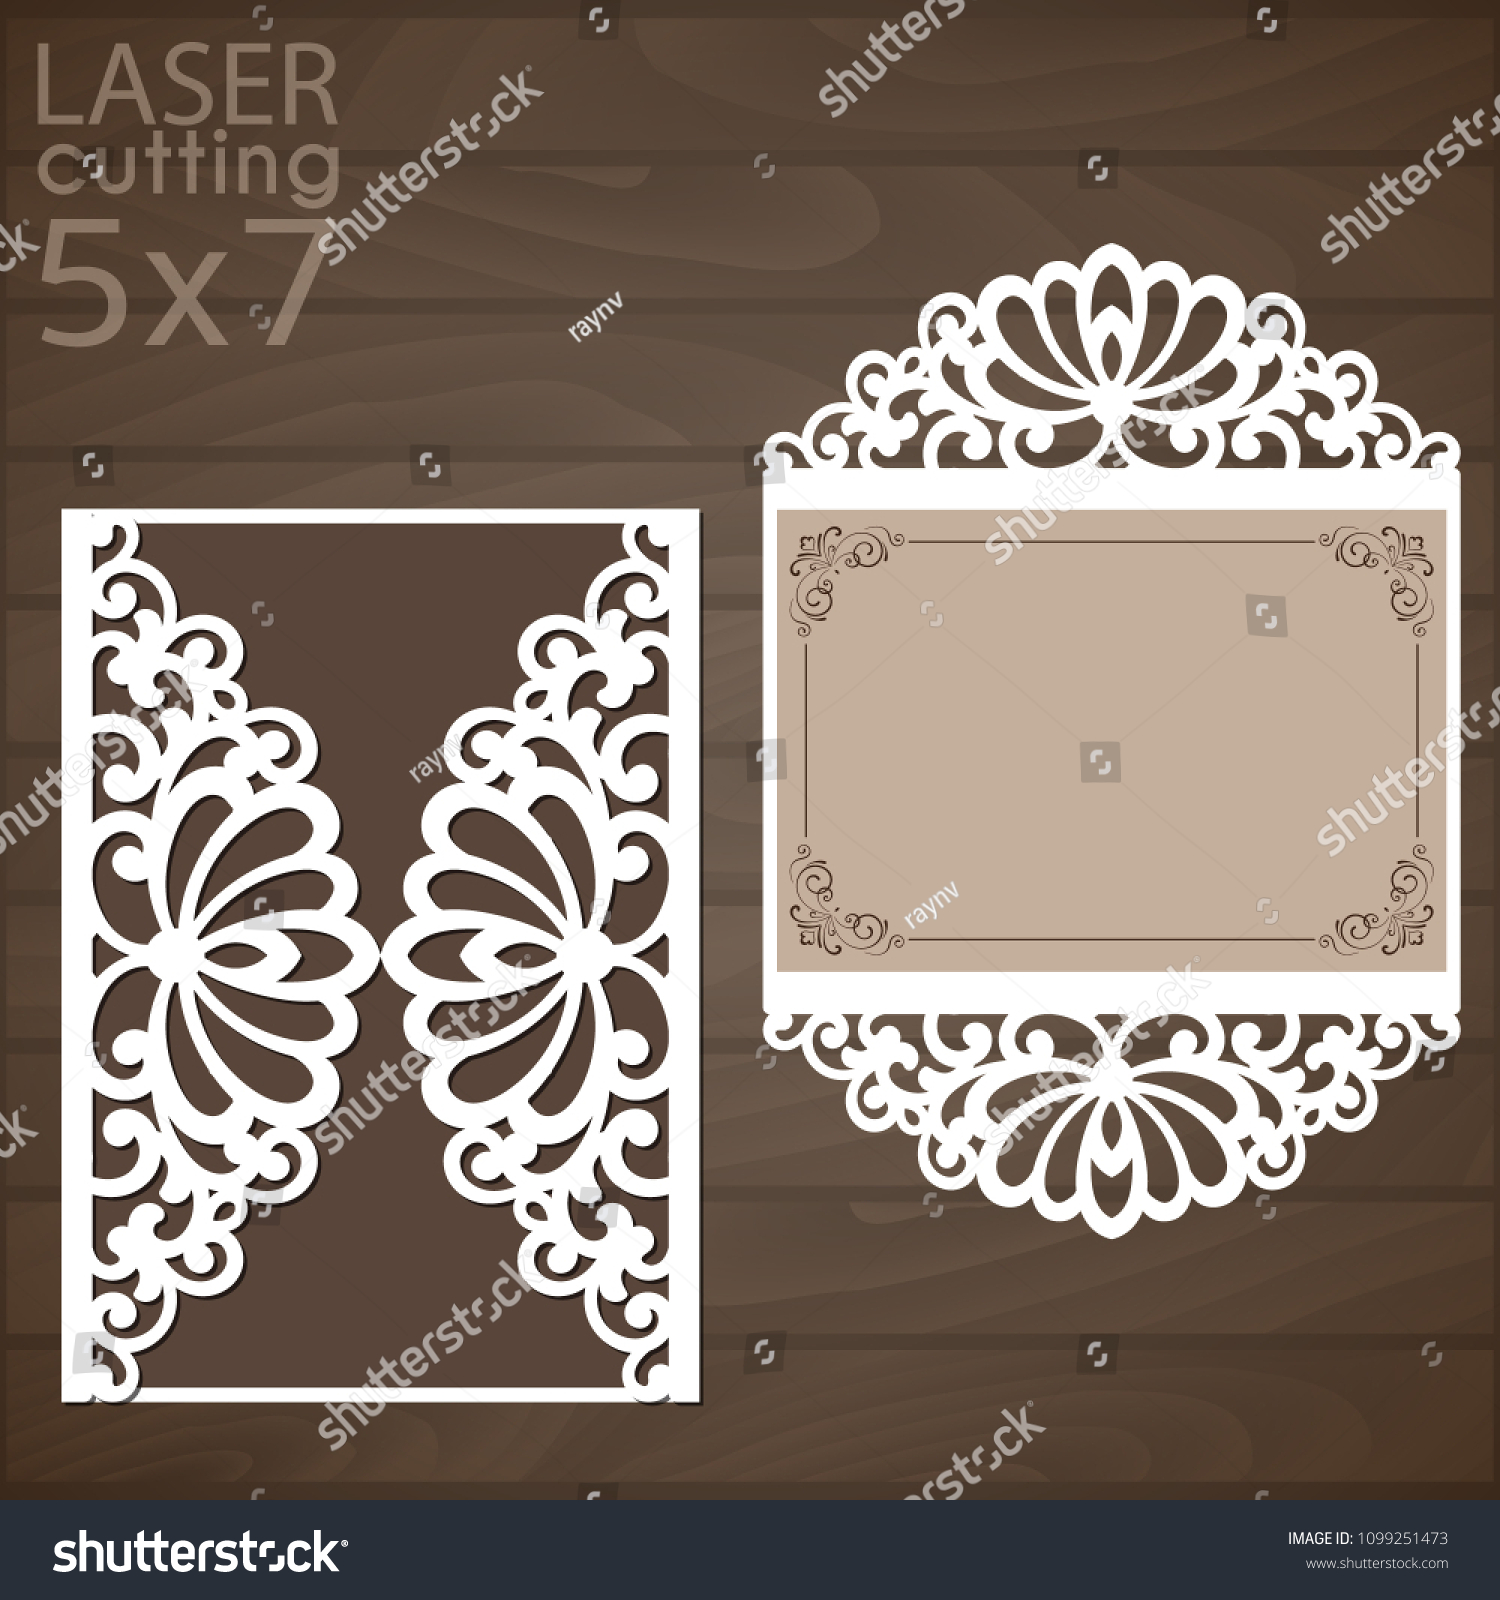 Laser Cut Wedding Invitation Card Template Stock Vector Royalty Free 1099251473